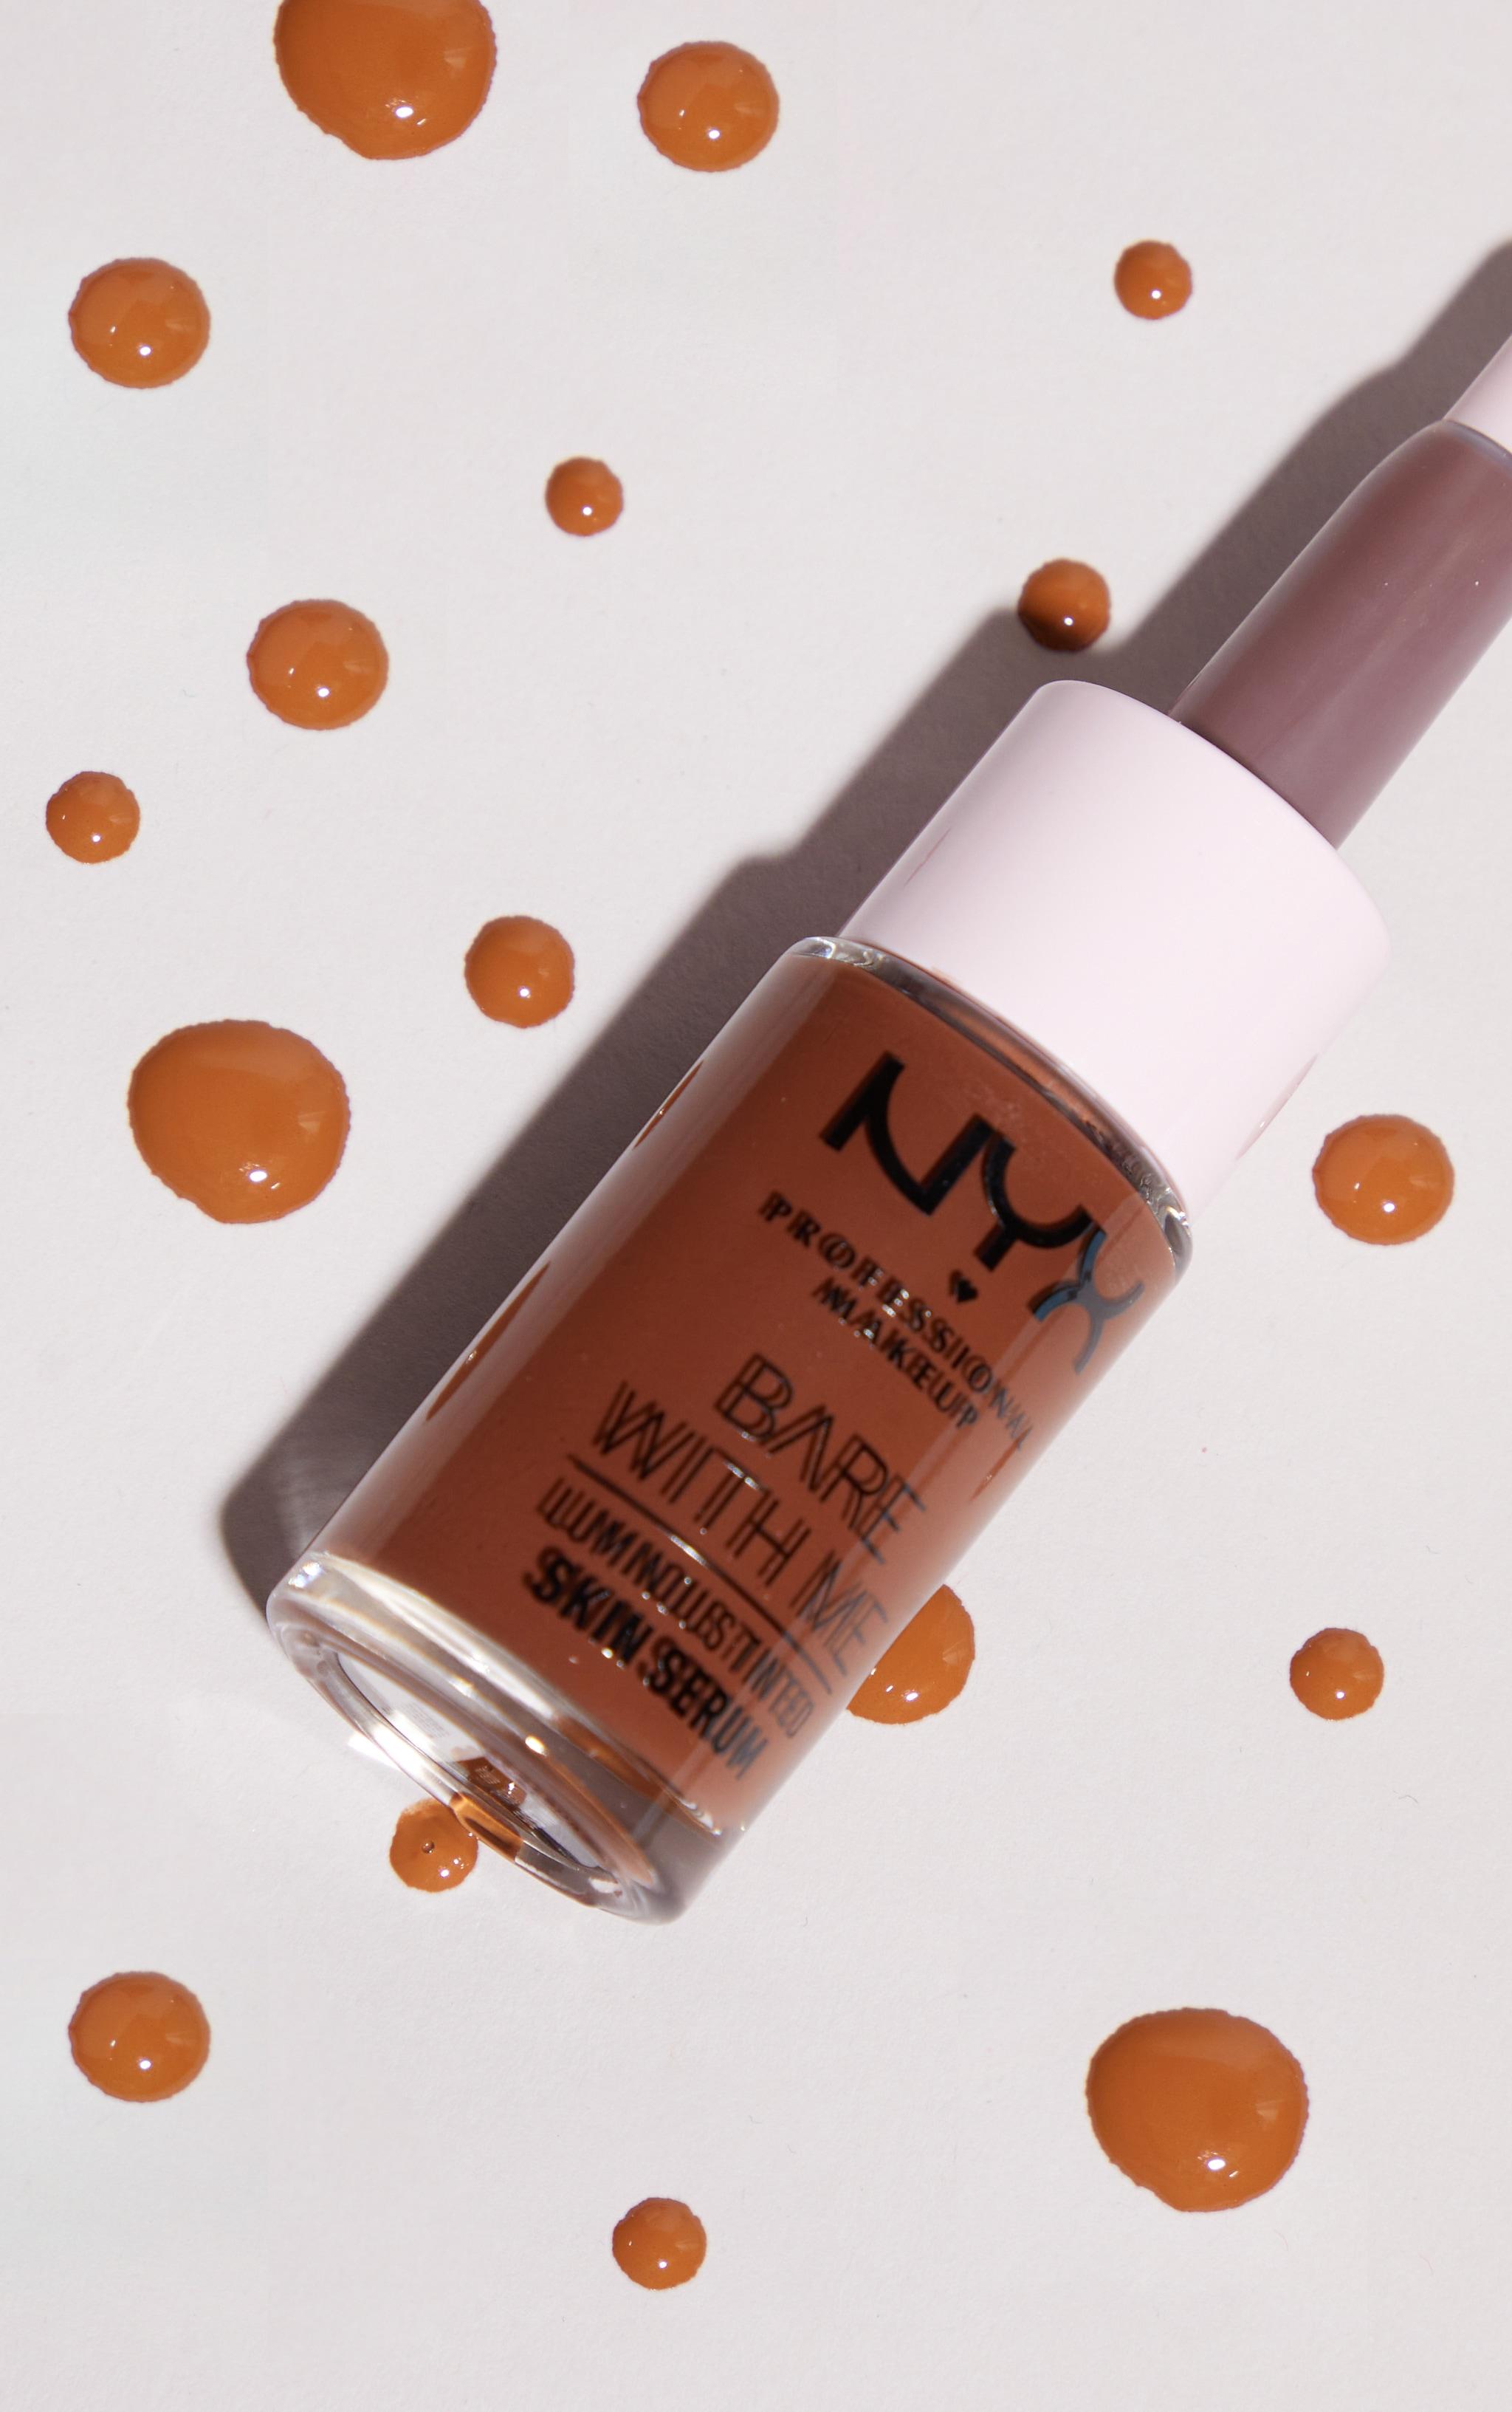 NYX PMU Bare With Me Luminous Tinted Skin Serum Deep 2